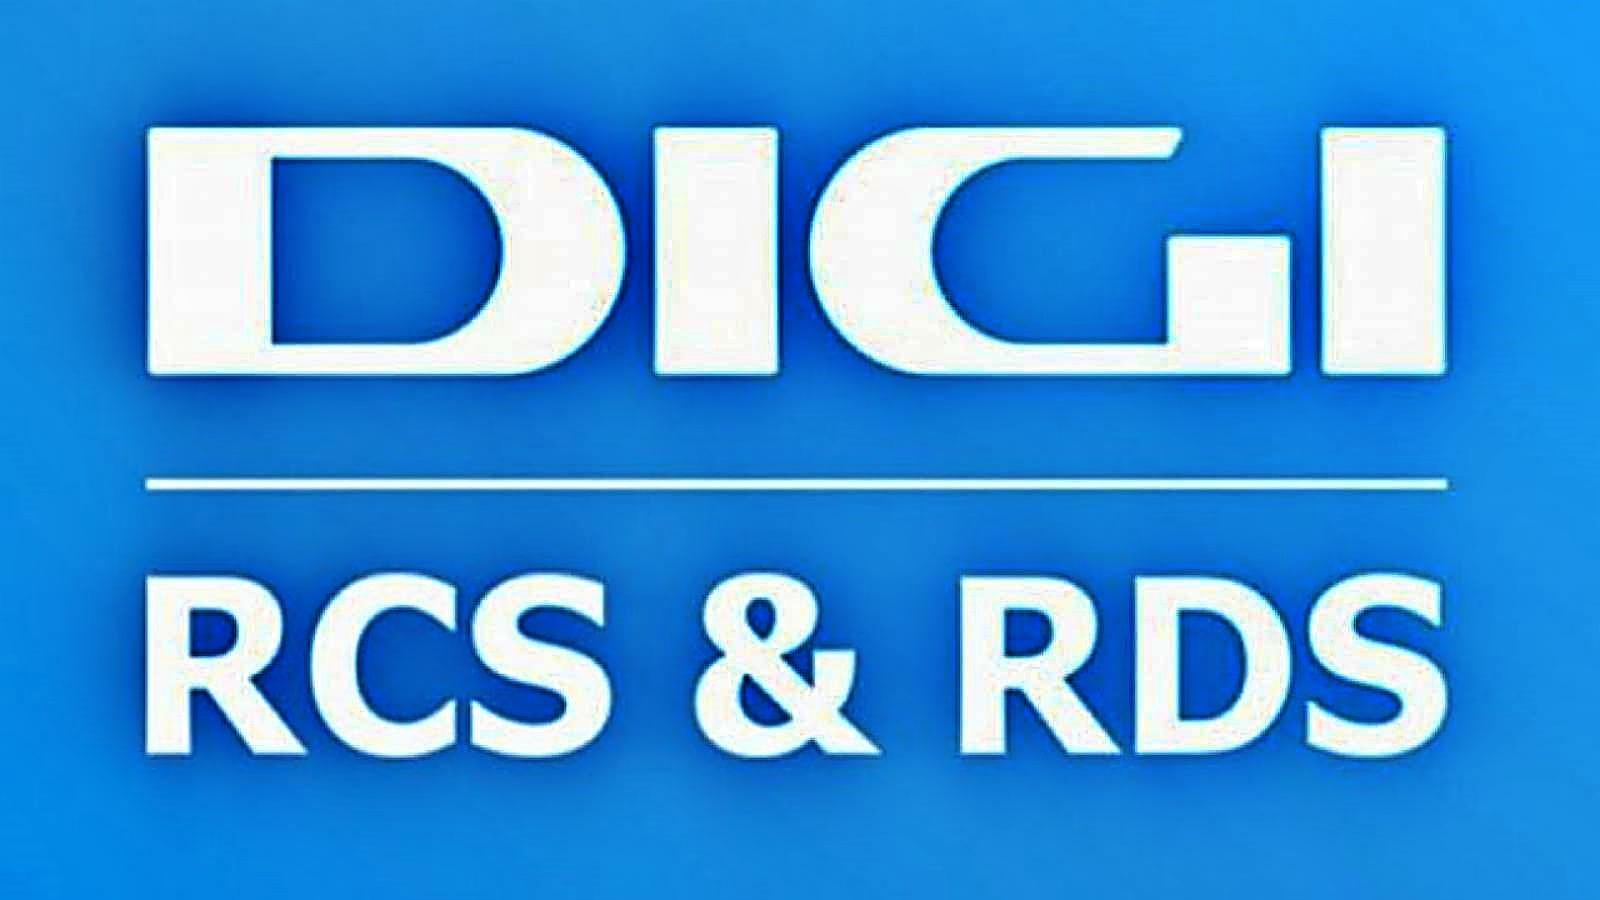 RCS & RDS terminare